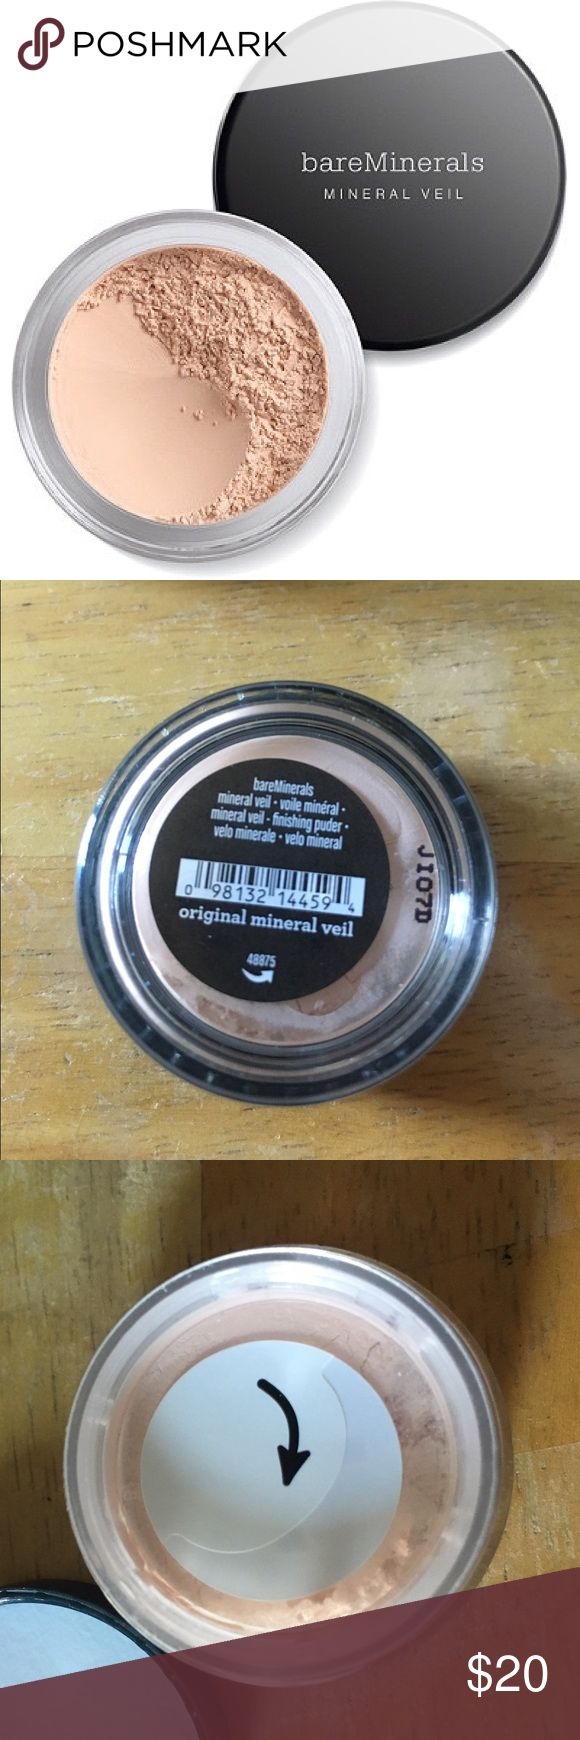 Bare minerals mineral veil Brand new Sephora Makeup